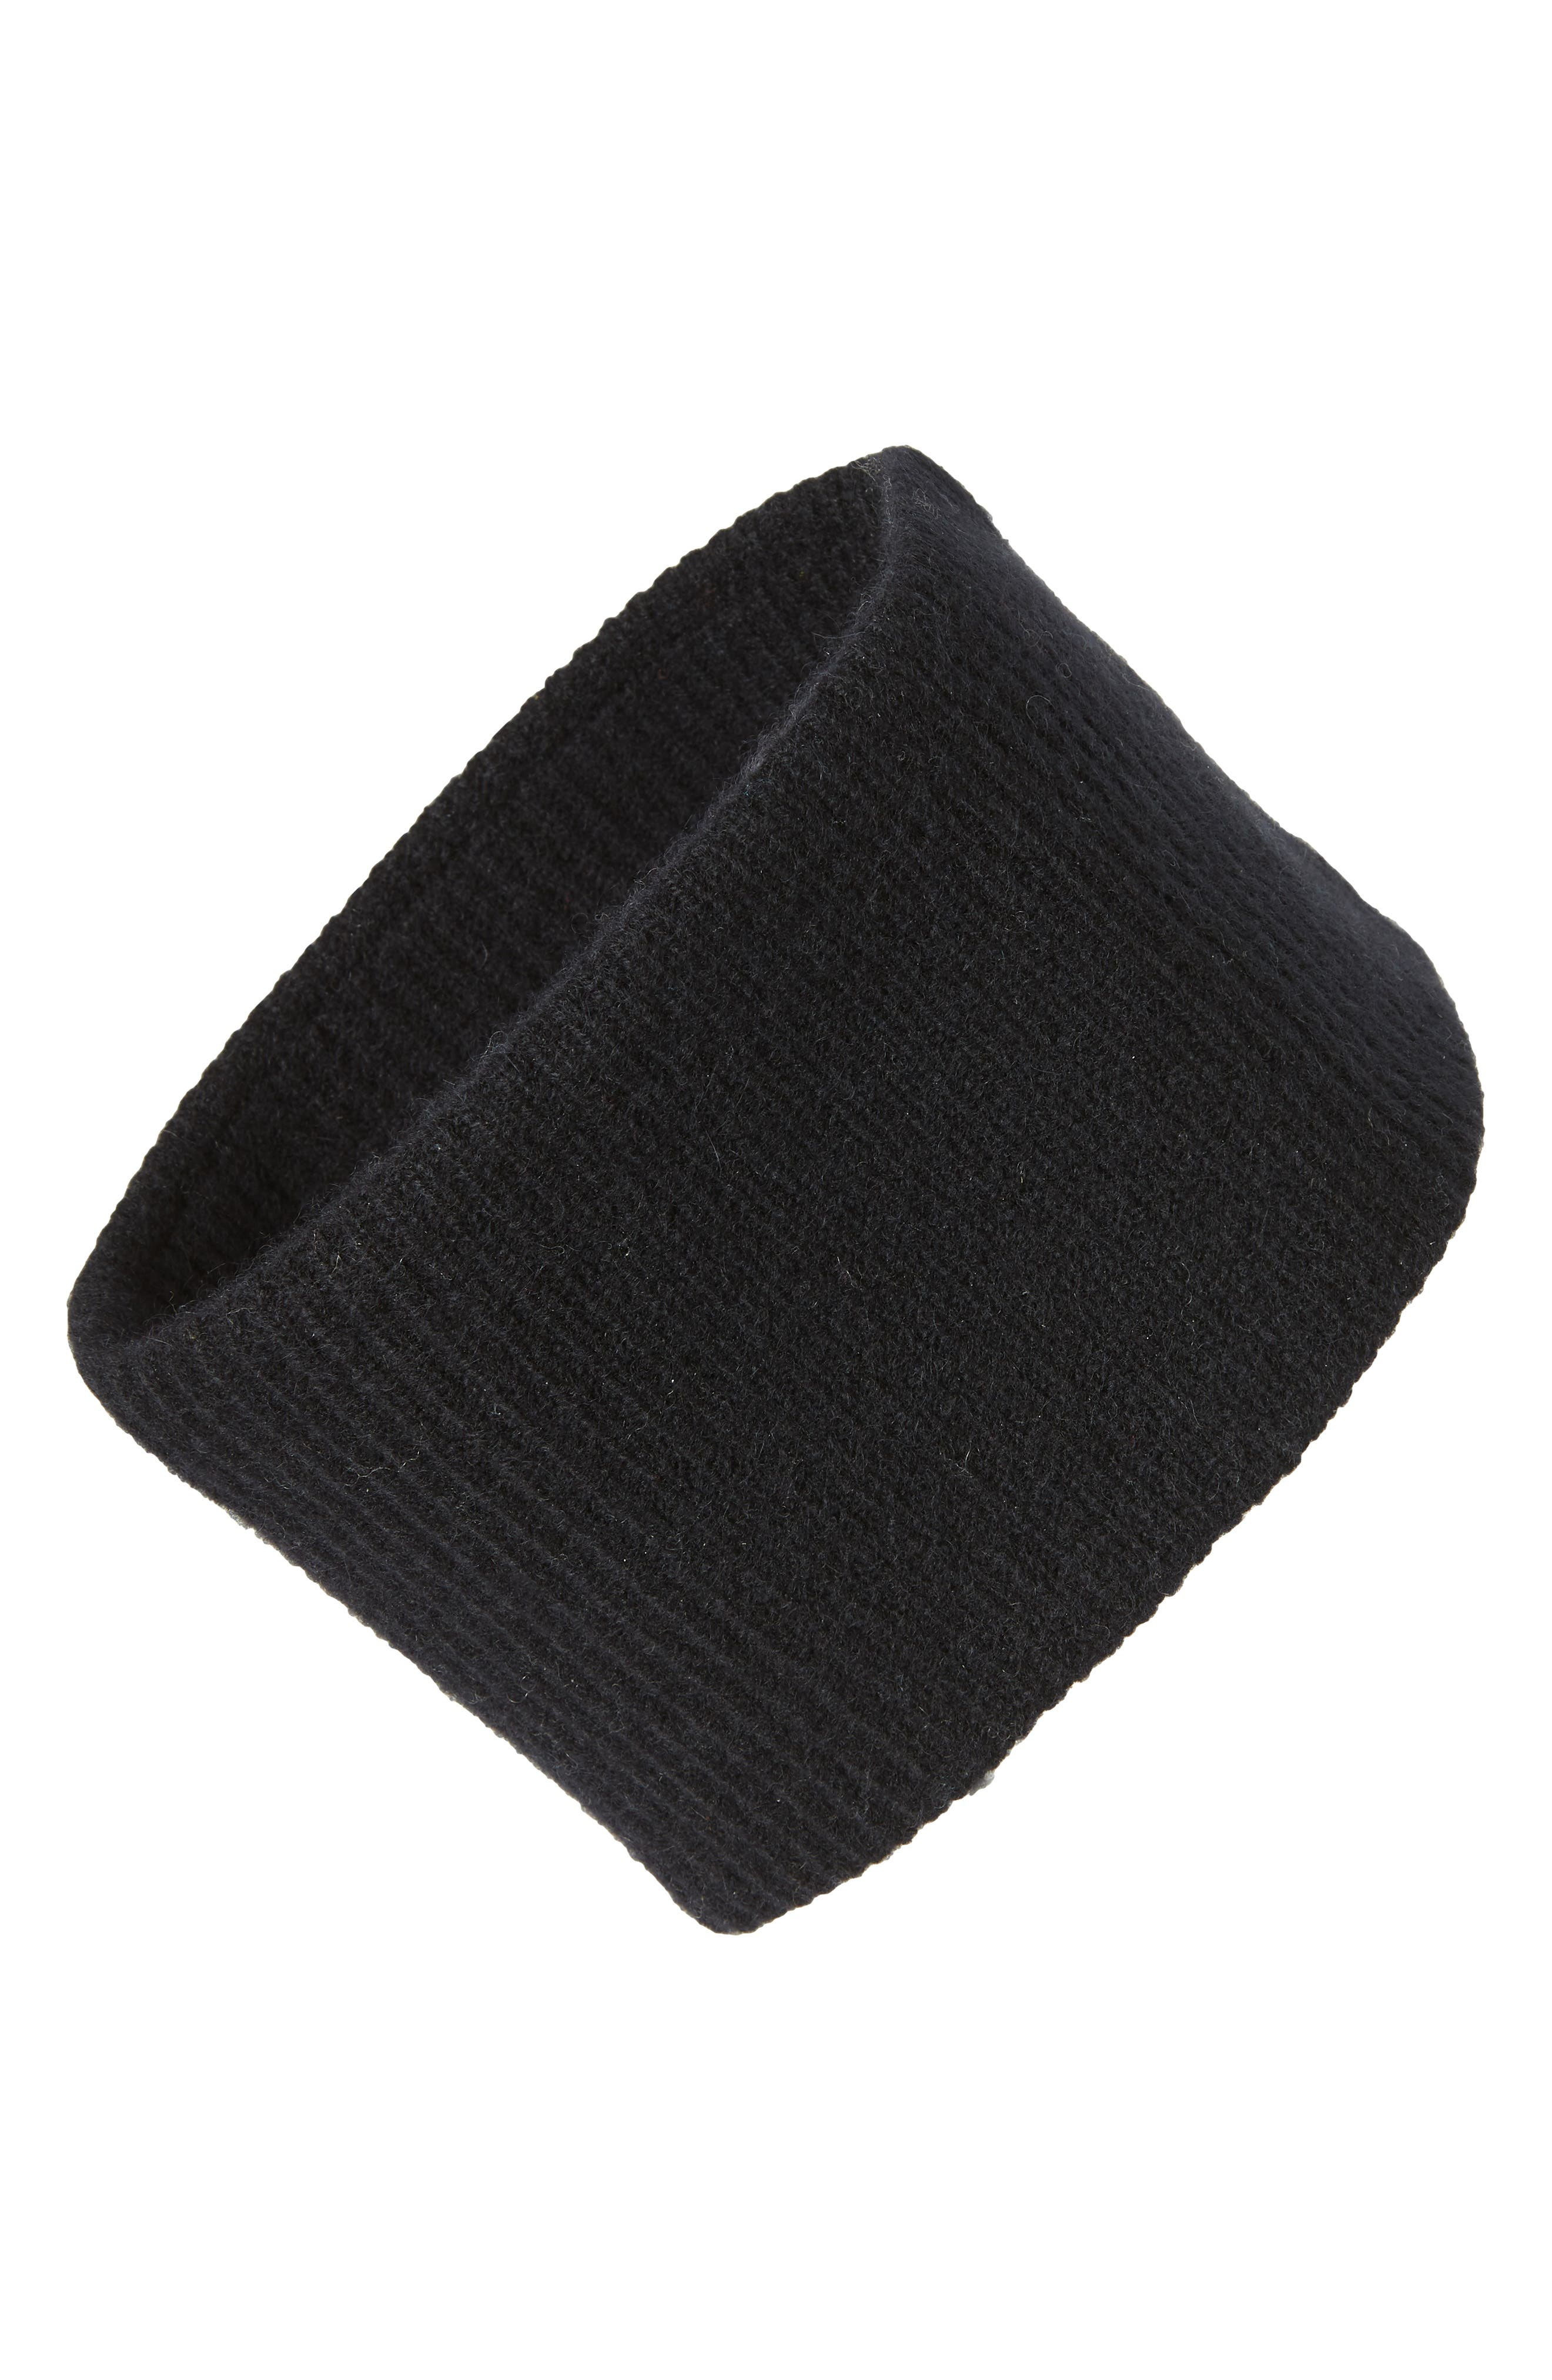 Ribbed Cashmere Head Wrap,                             Main thumbnail 1, color,                             BLACK